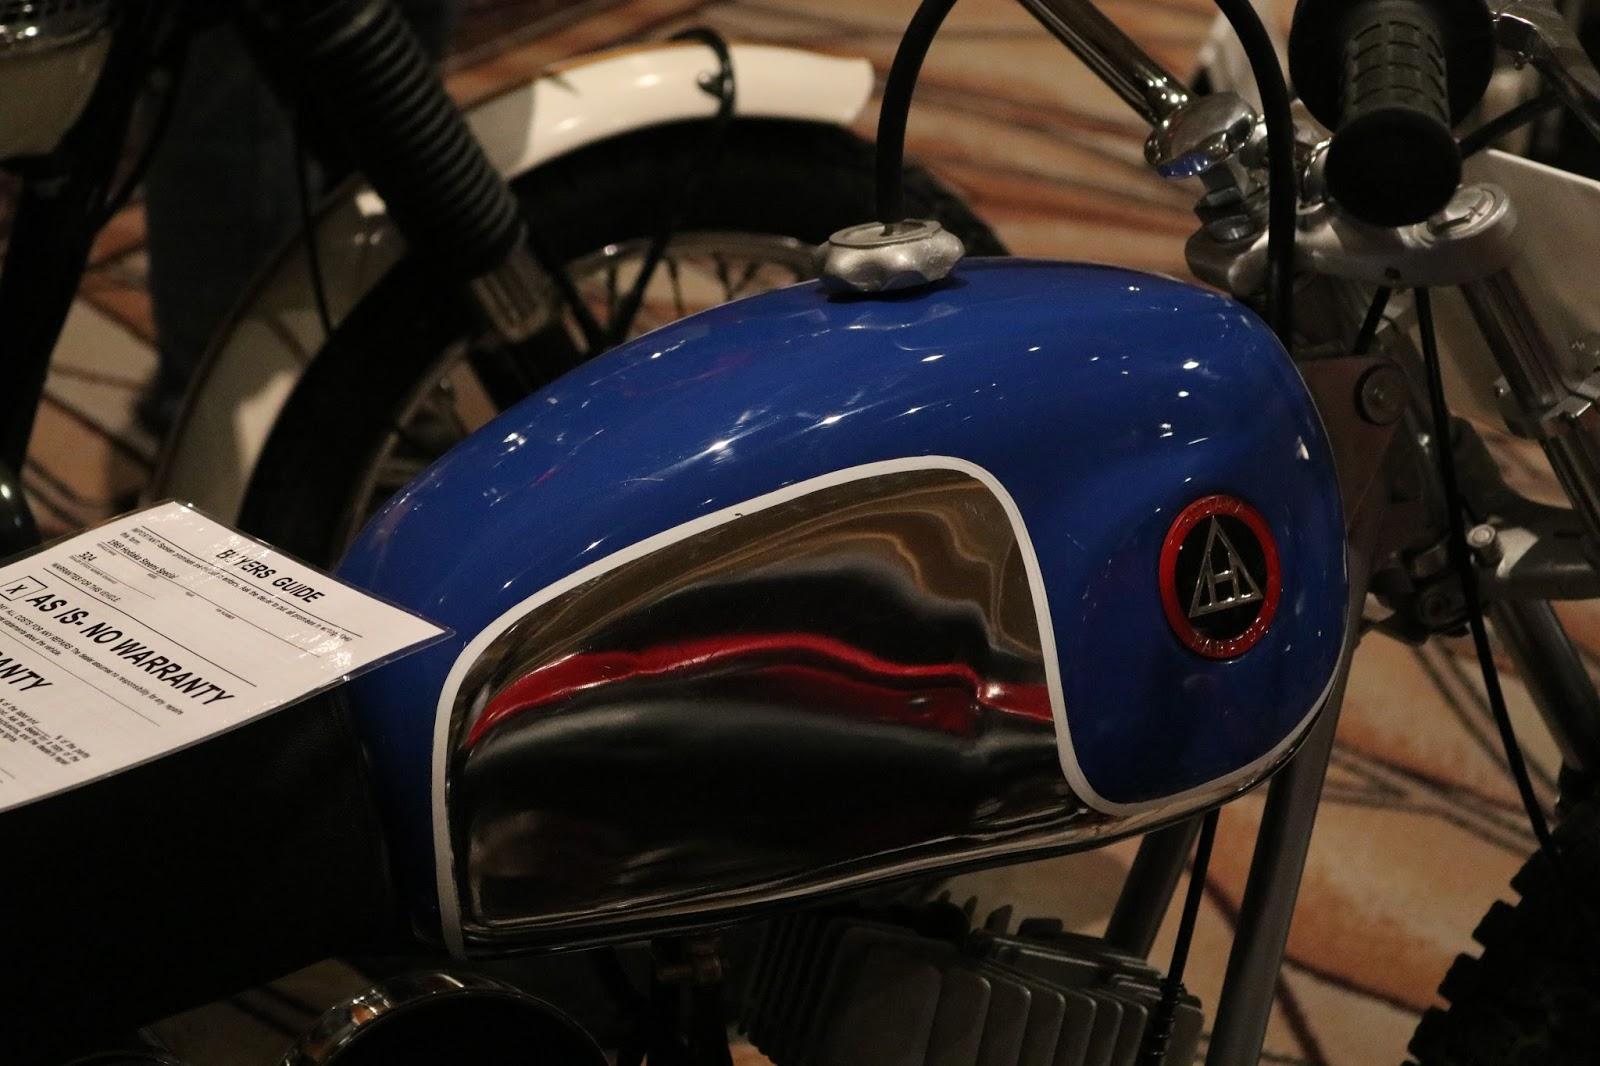 Evel Knievel Bike At Bonham S Las Vegas Moto Auction: OldMotoDude: 1969 Hodaka Steens Flat Tracker $7,475 At The